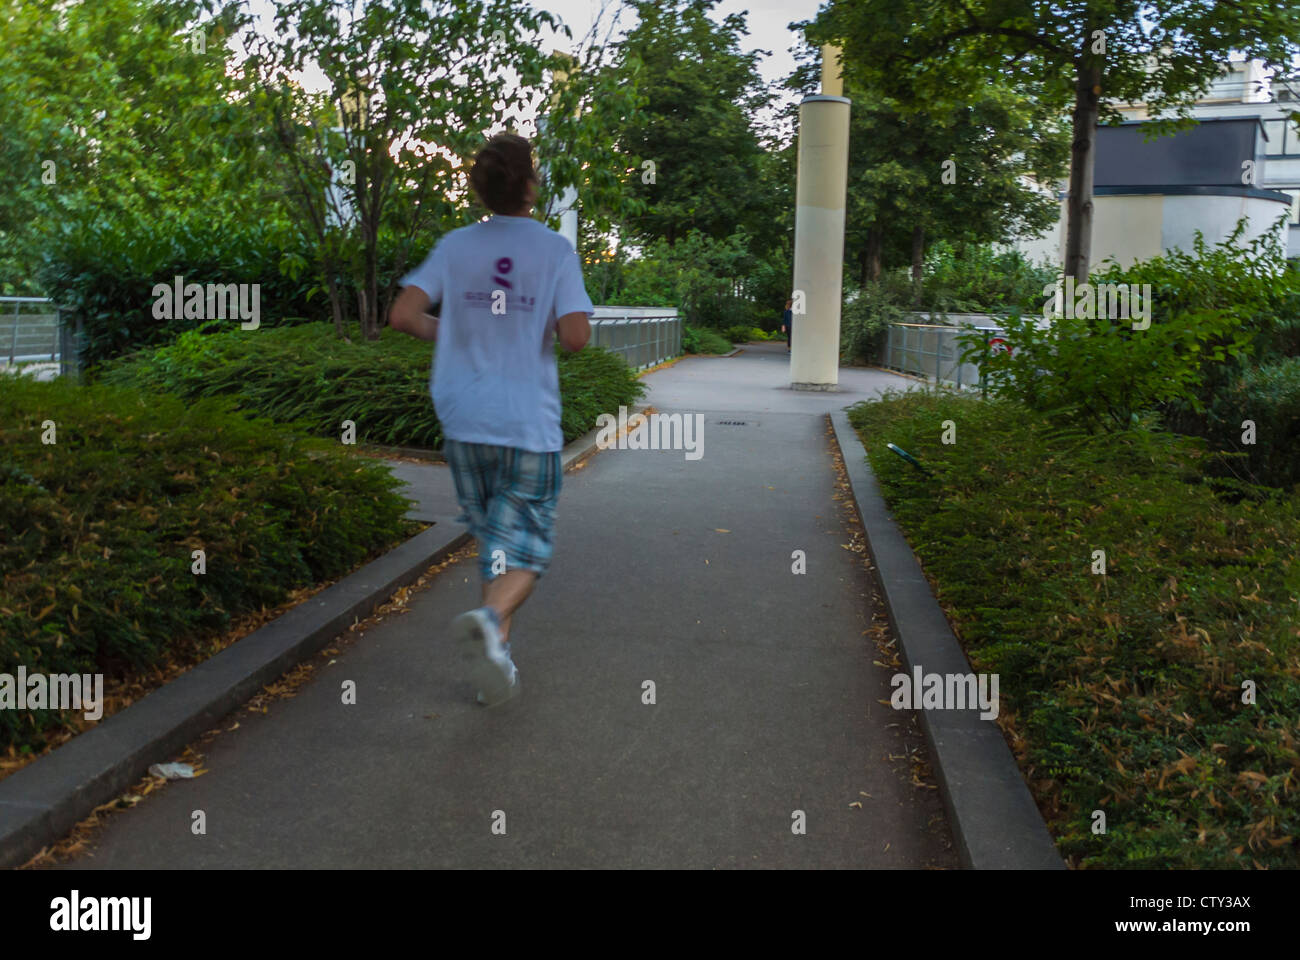 Paris, France,  Man Jogging, Running Away, on Pathway in 'Promenade Plantée' Public park, Alone, adult - Stock Image